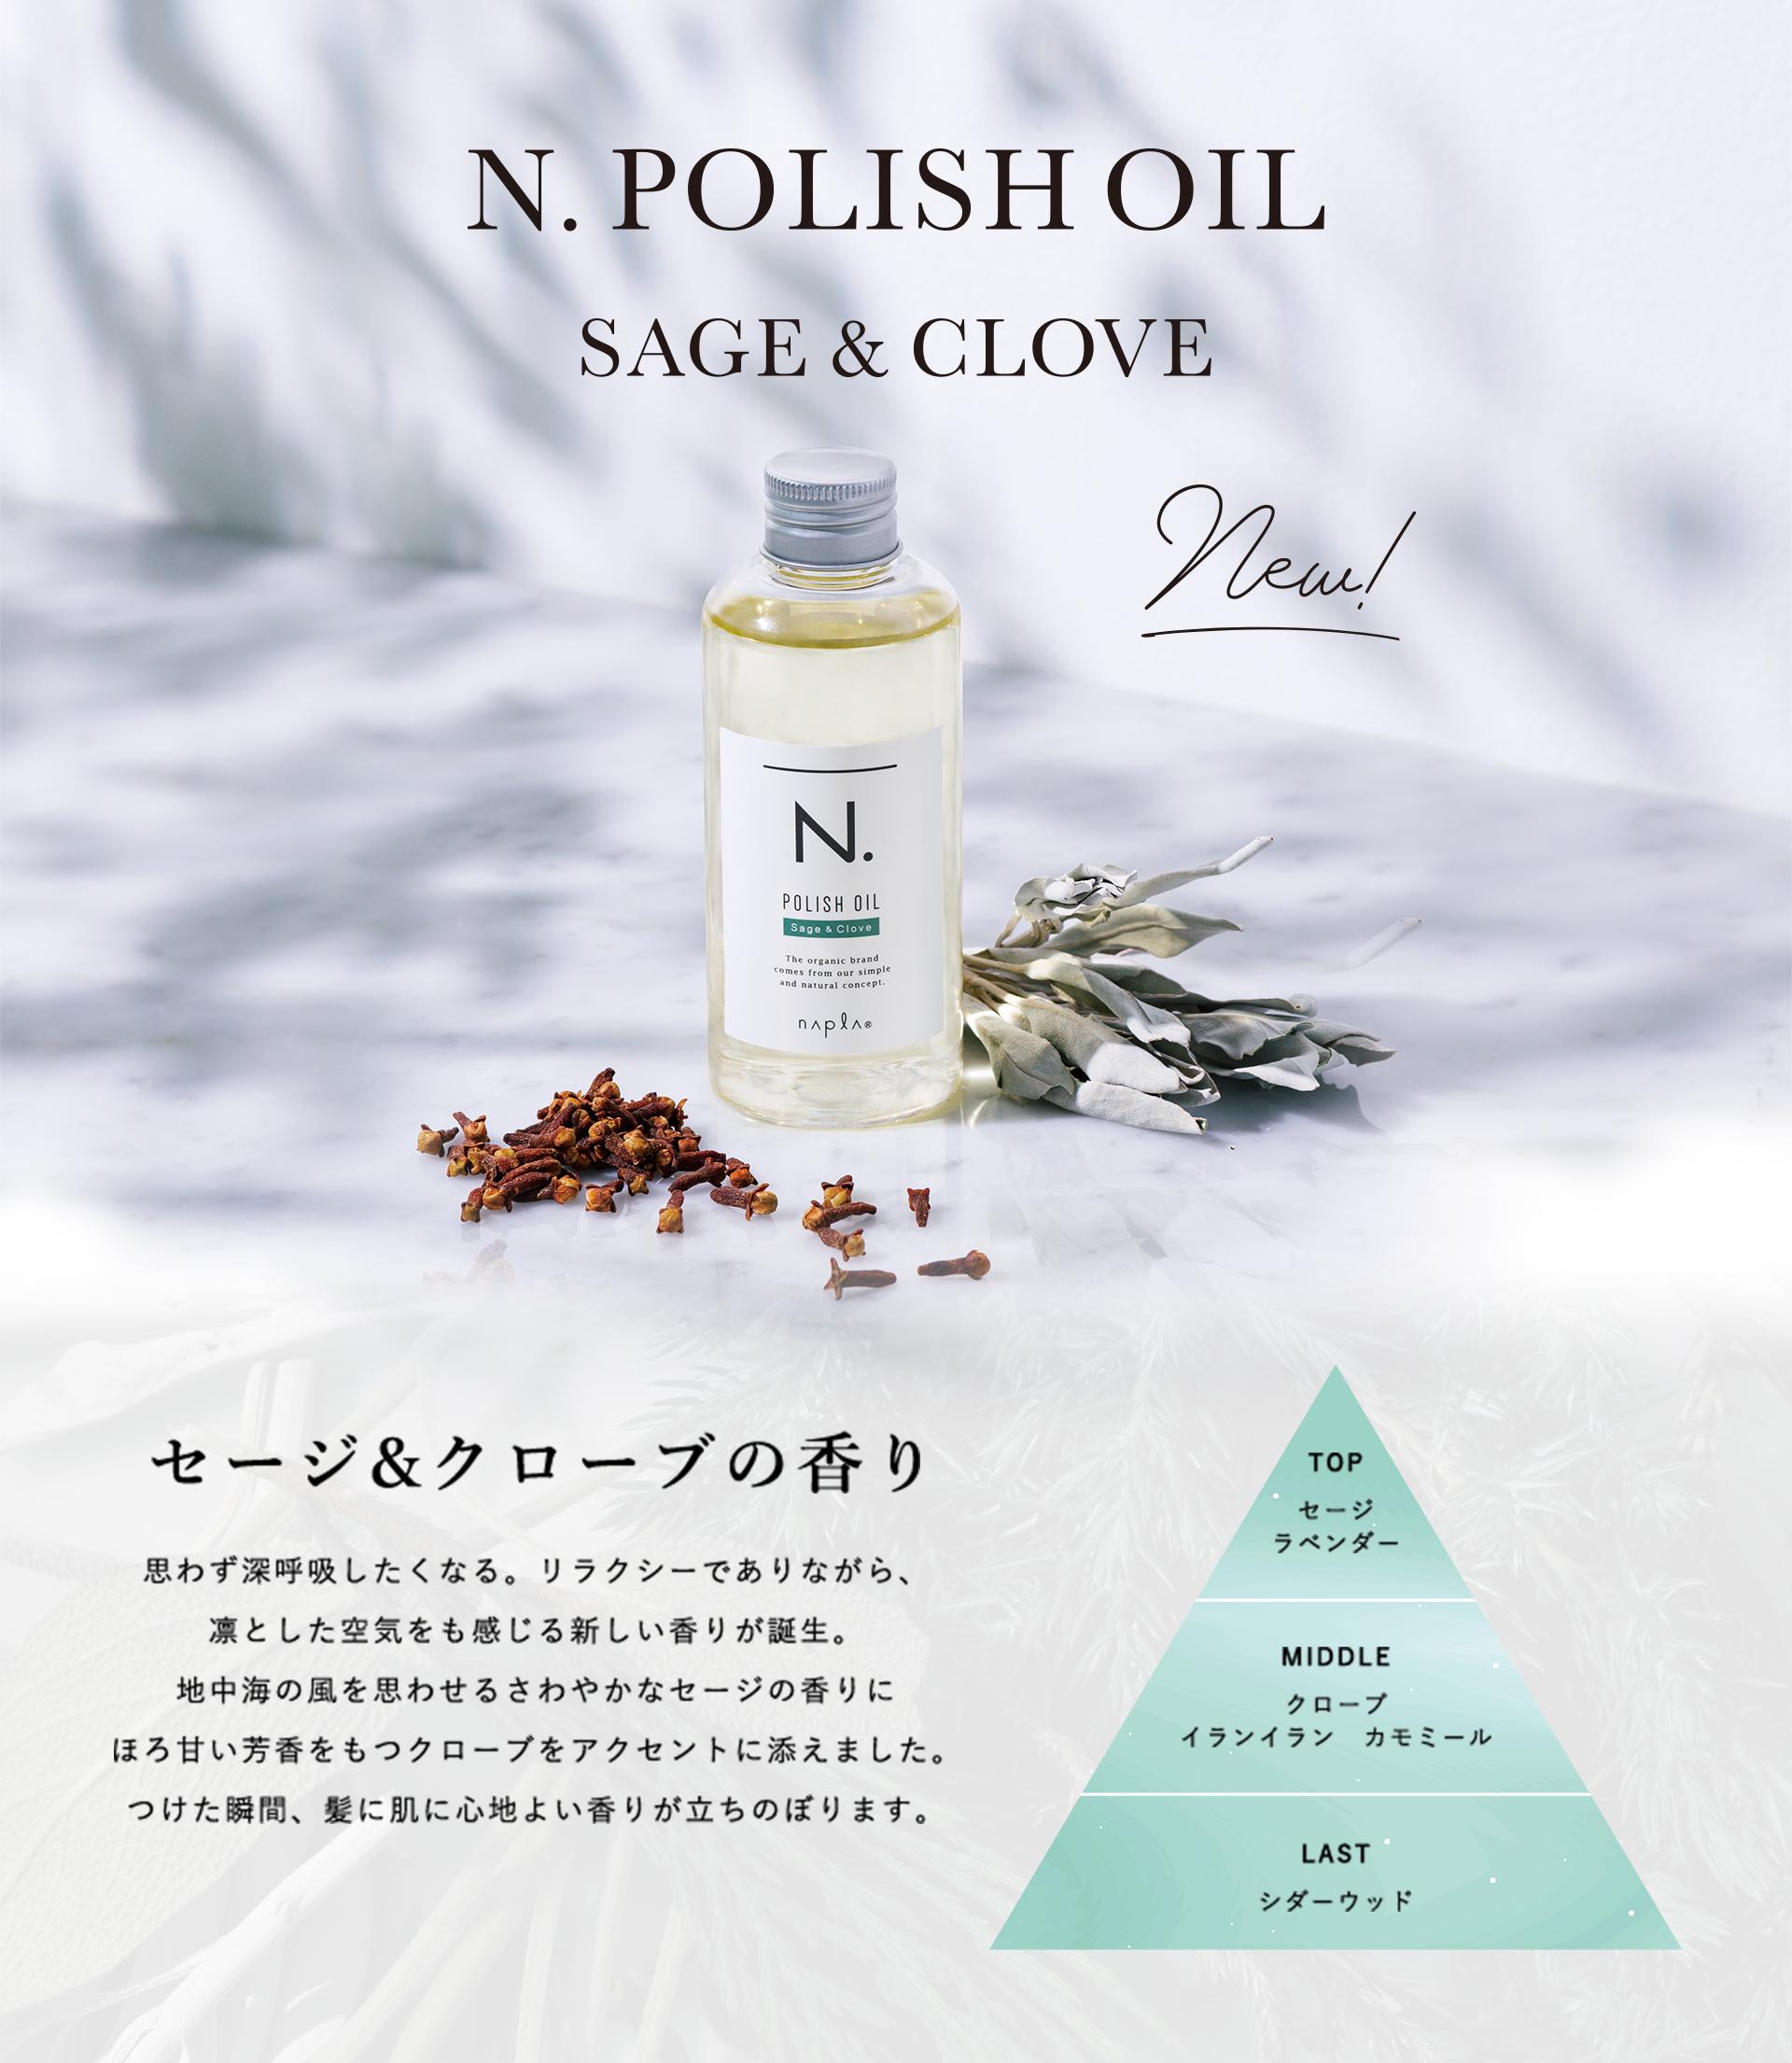 N. POLISH OIL SAGE & CLOVE